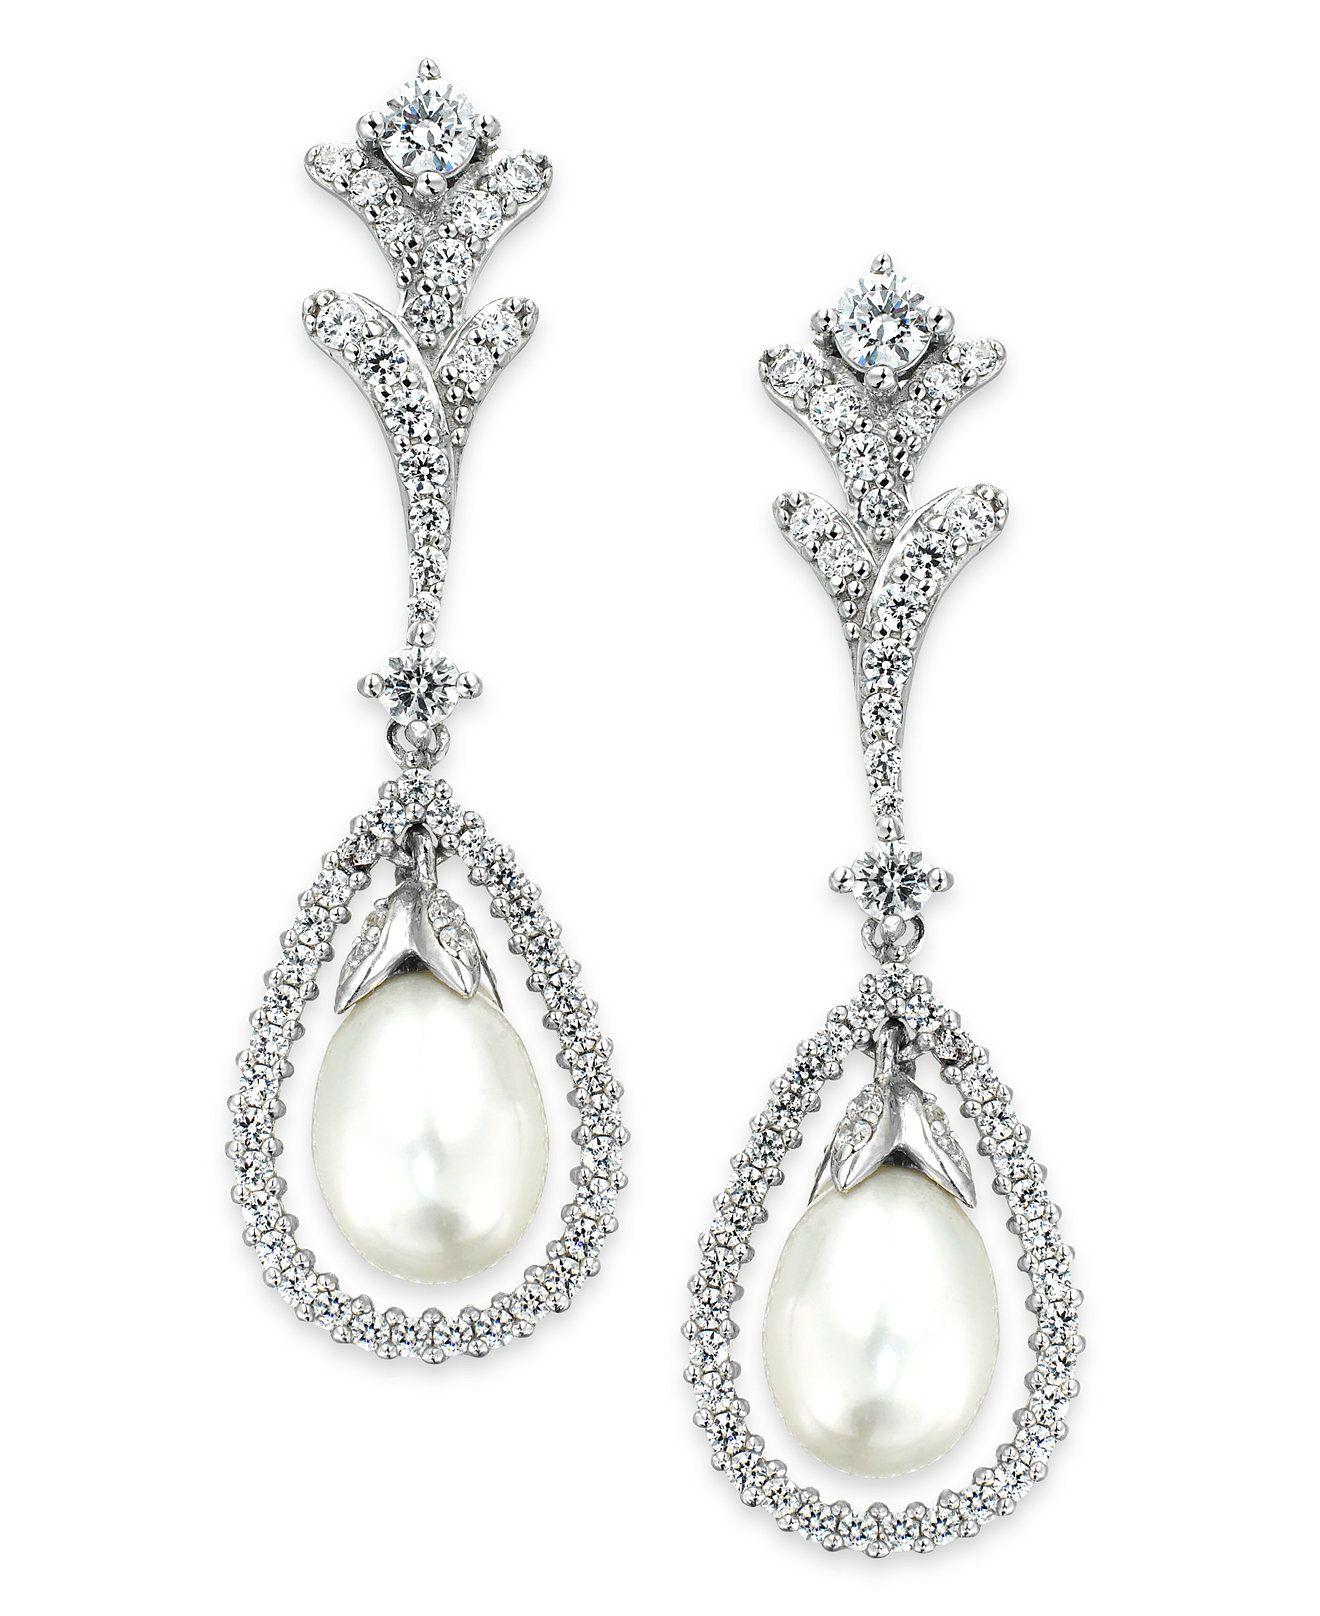 arabella bridal cultured freshwater pearl 7mm and swarovski